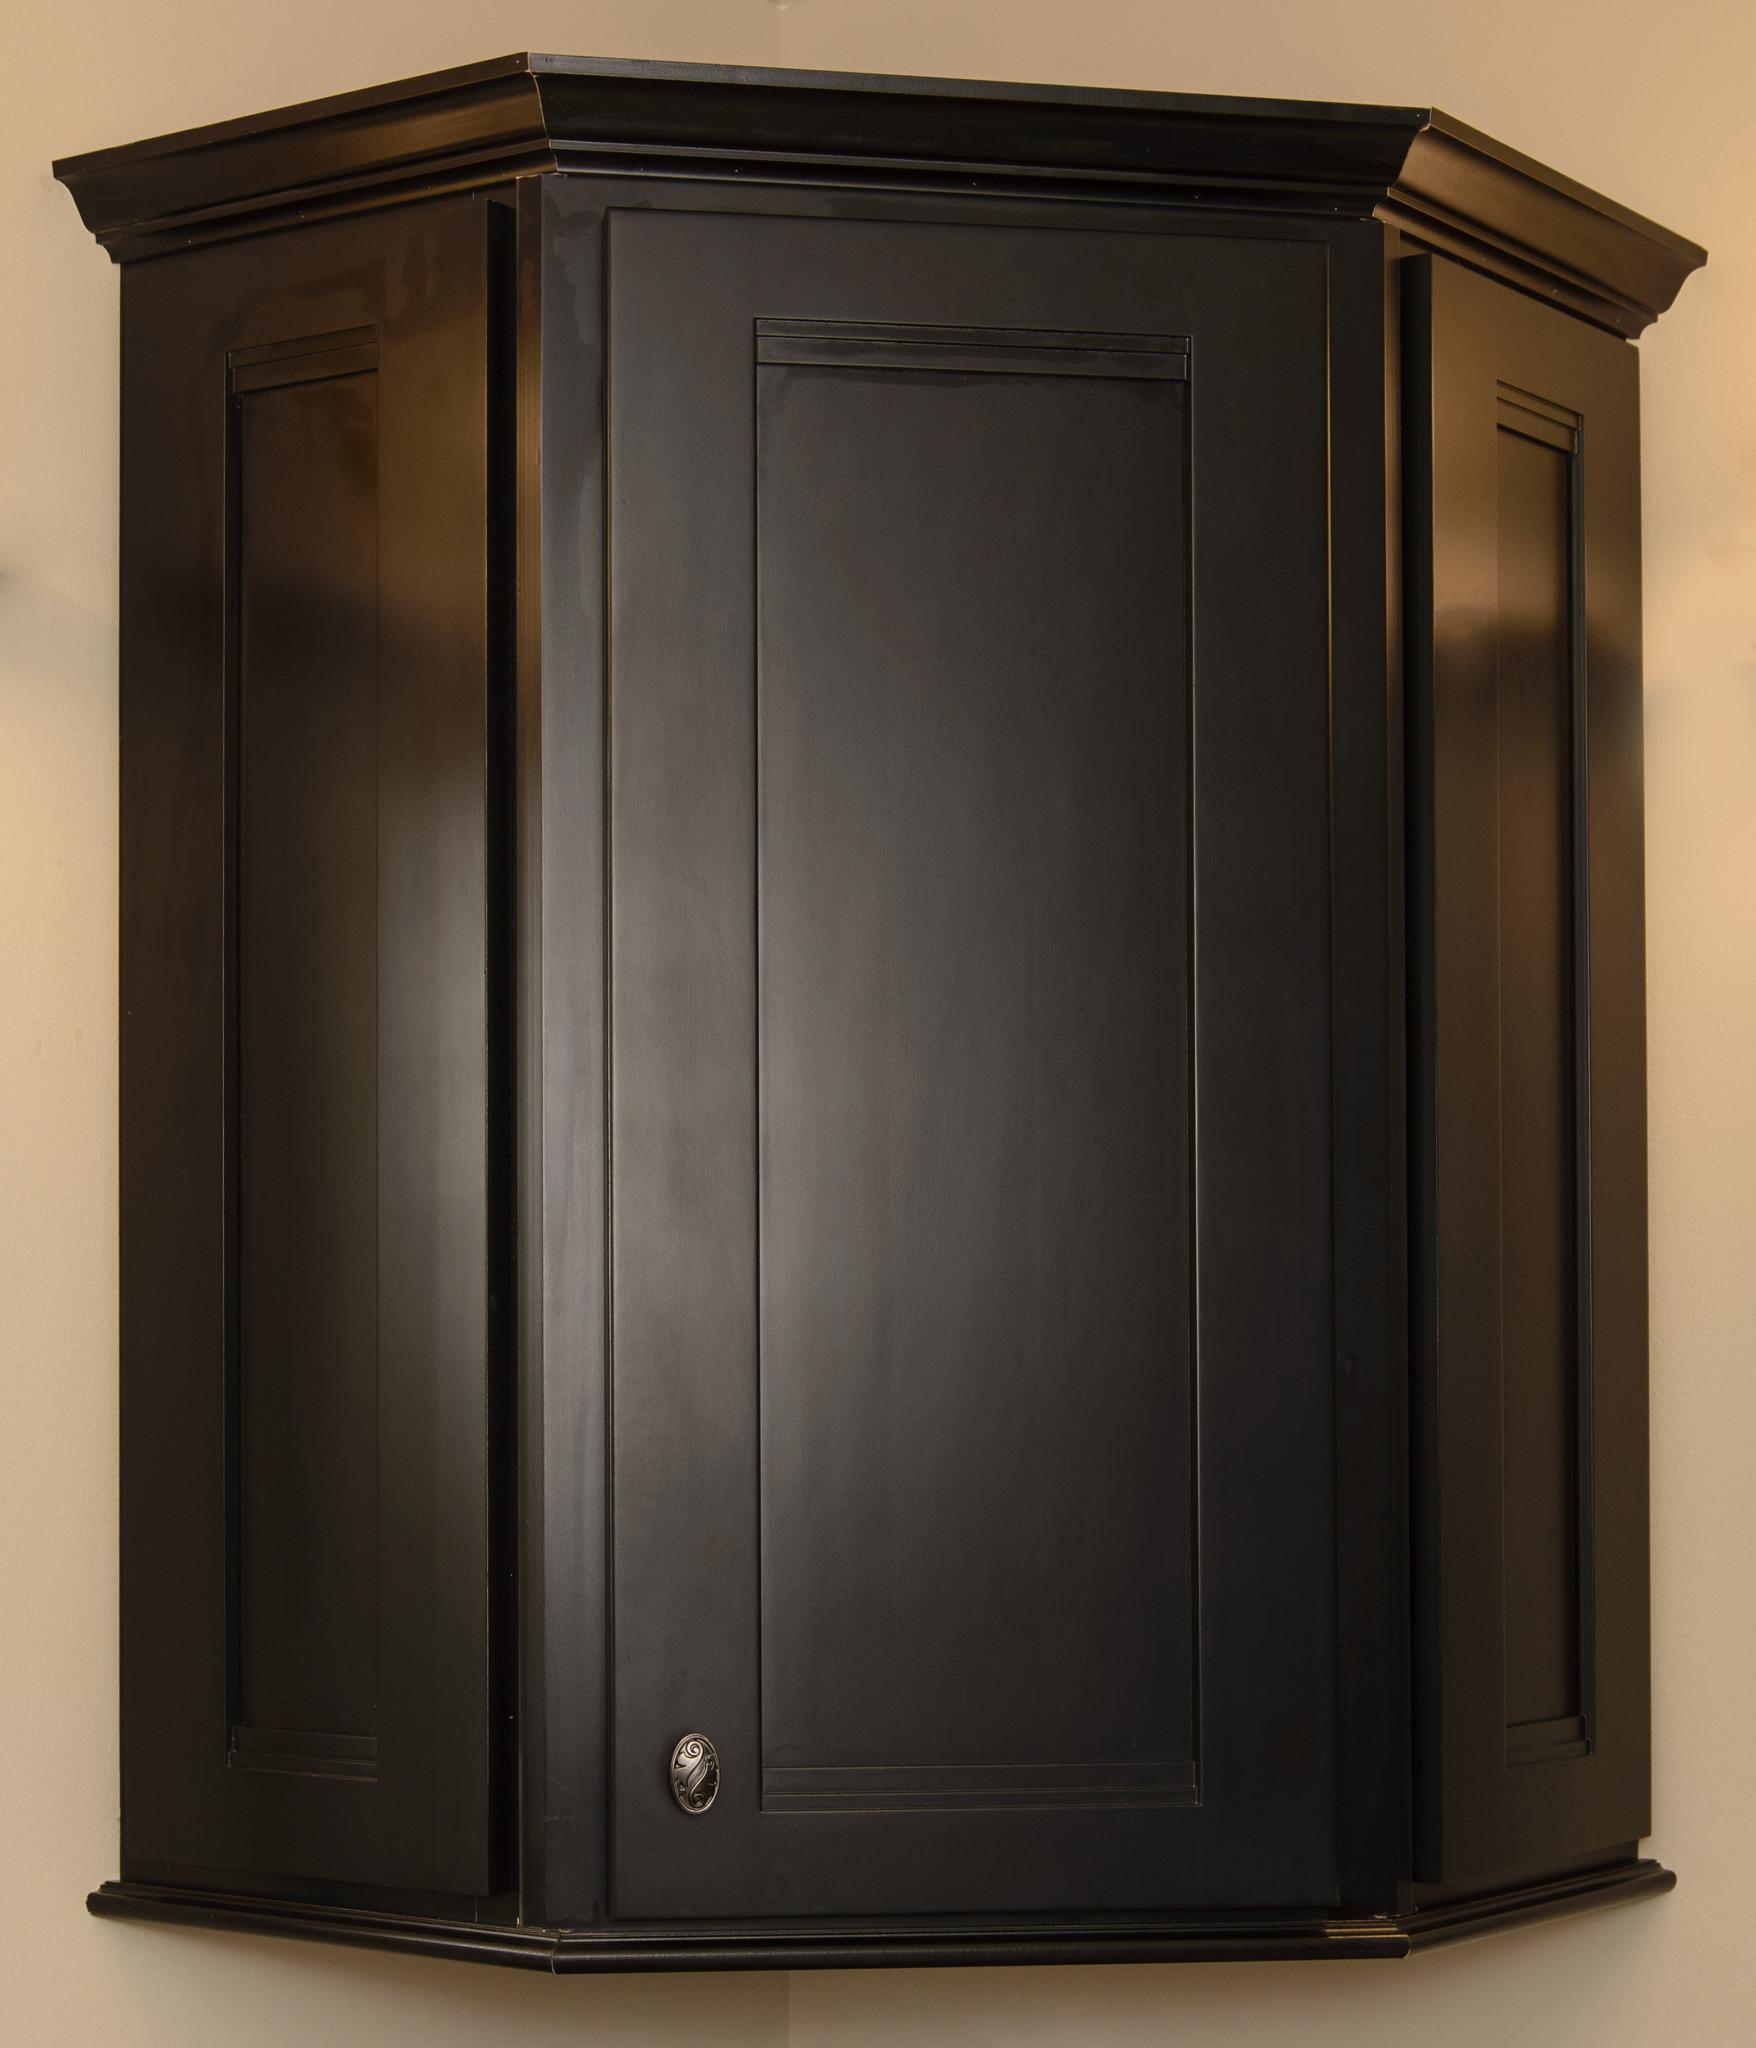 Elmwood Kitchen Cabinet Door Styles: Kitchen Cabinets 03 Unique Home Design